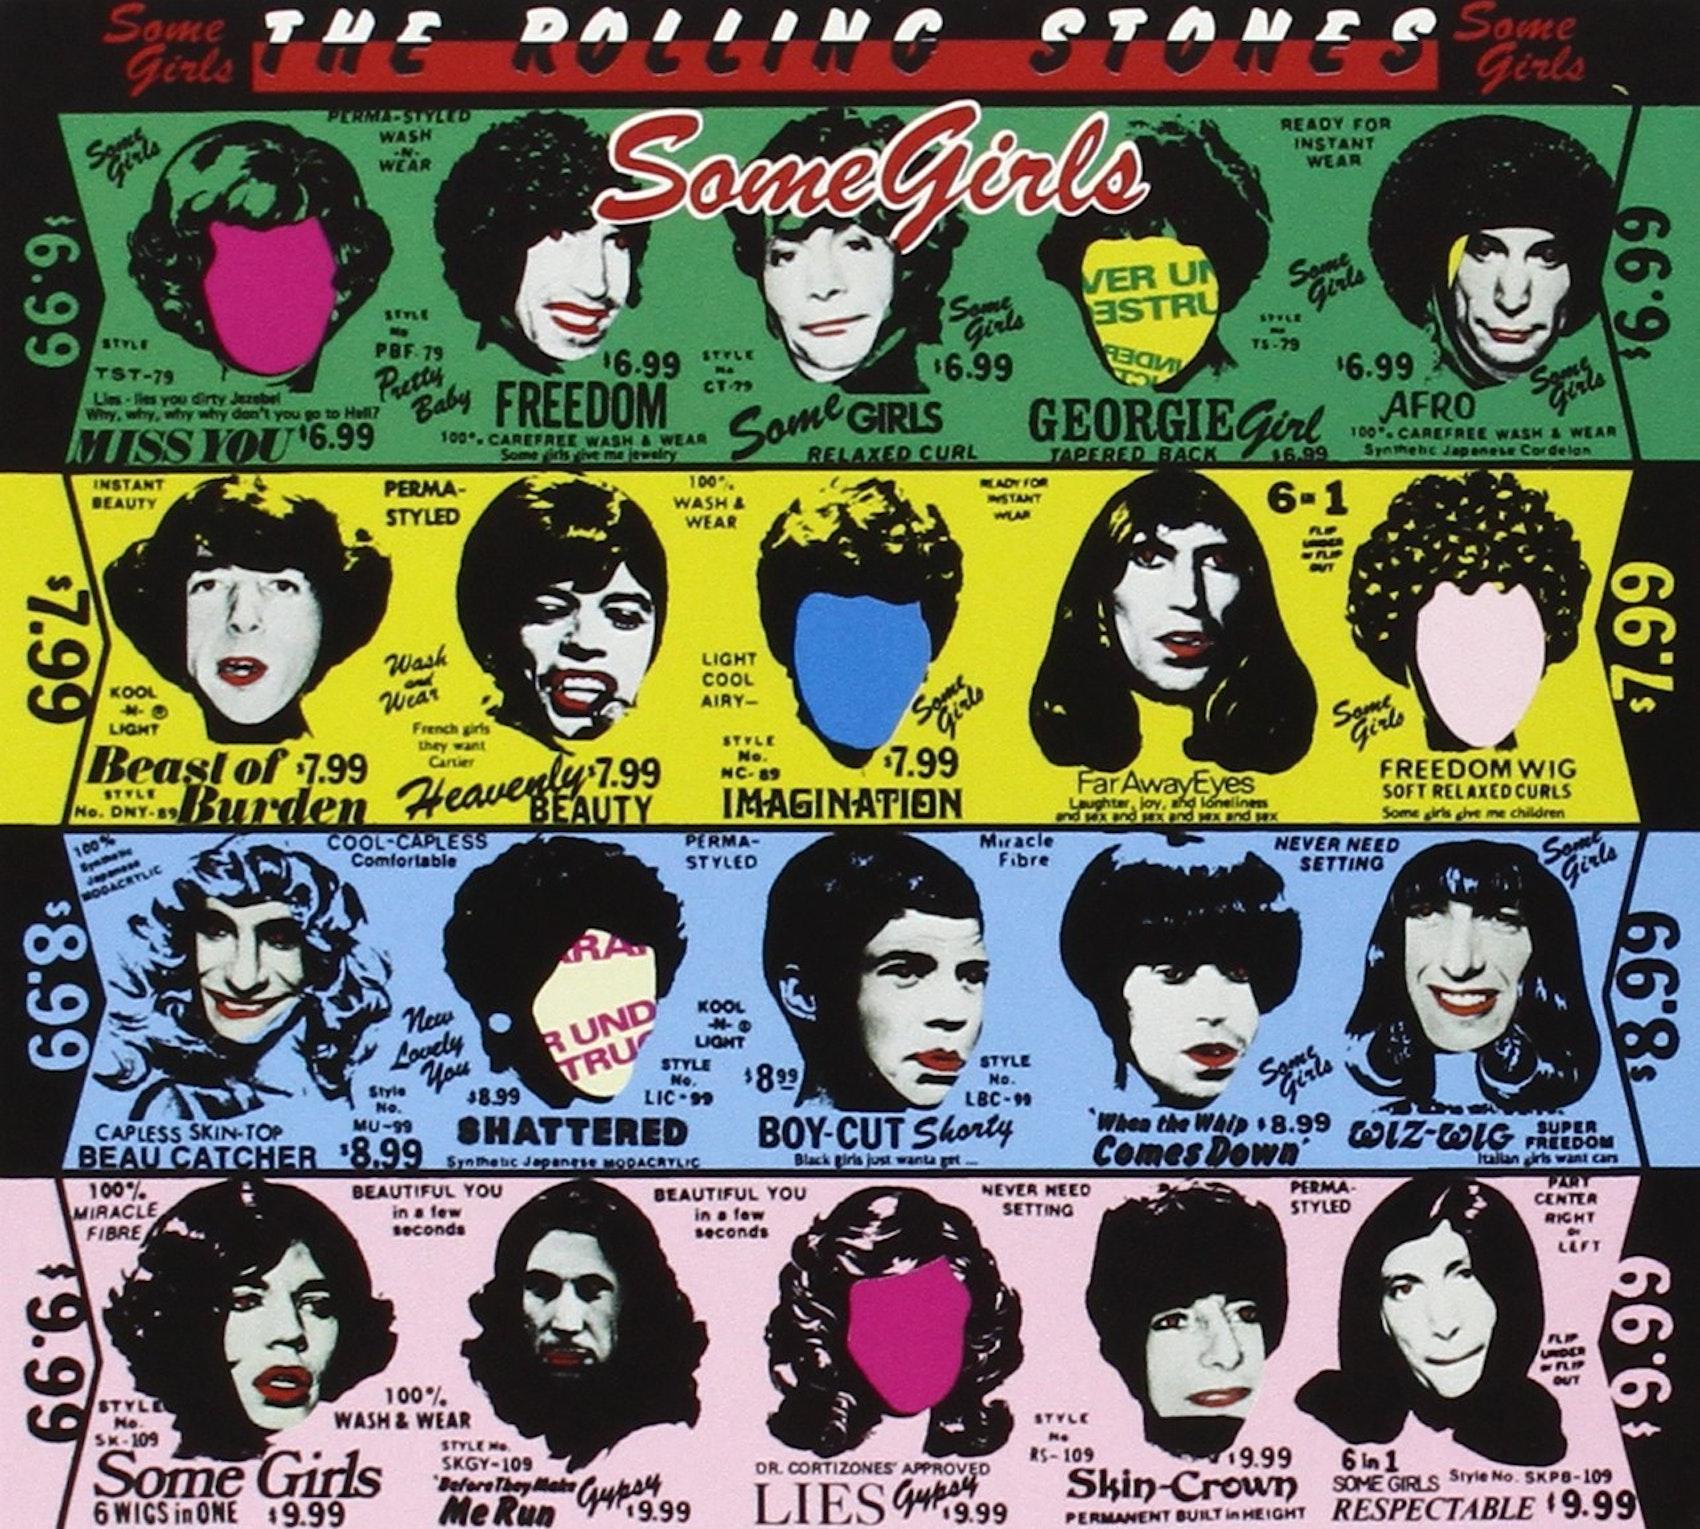 The 10 Best Rolling Stones Albums To Own On Vinyl — Vinyl Me, Please